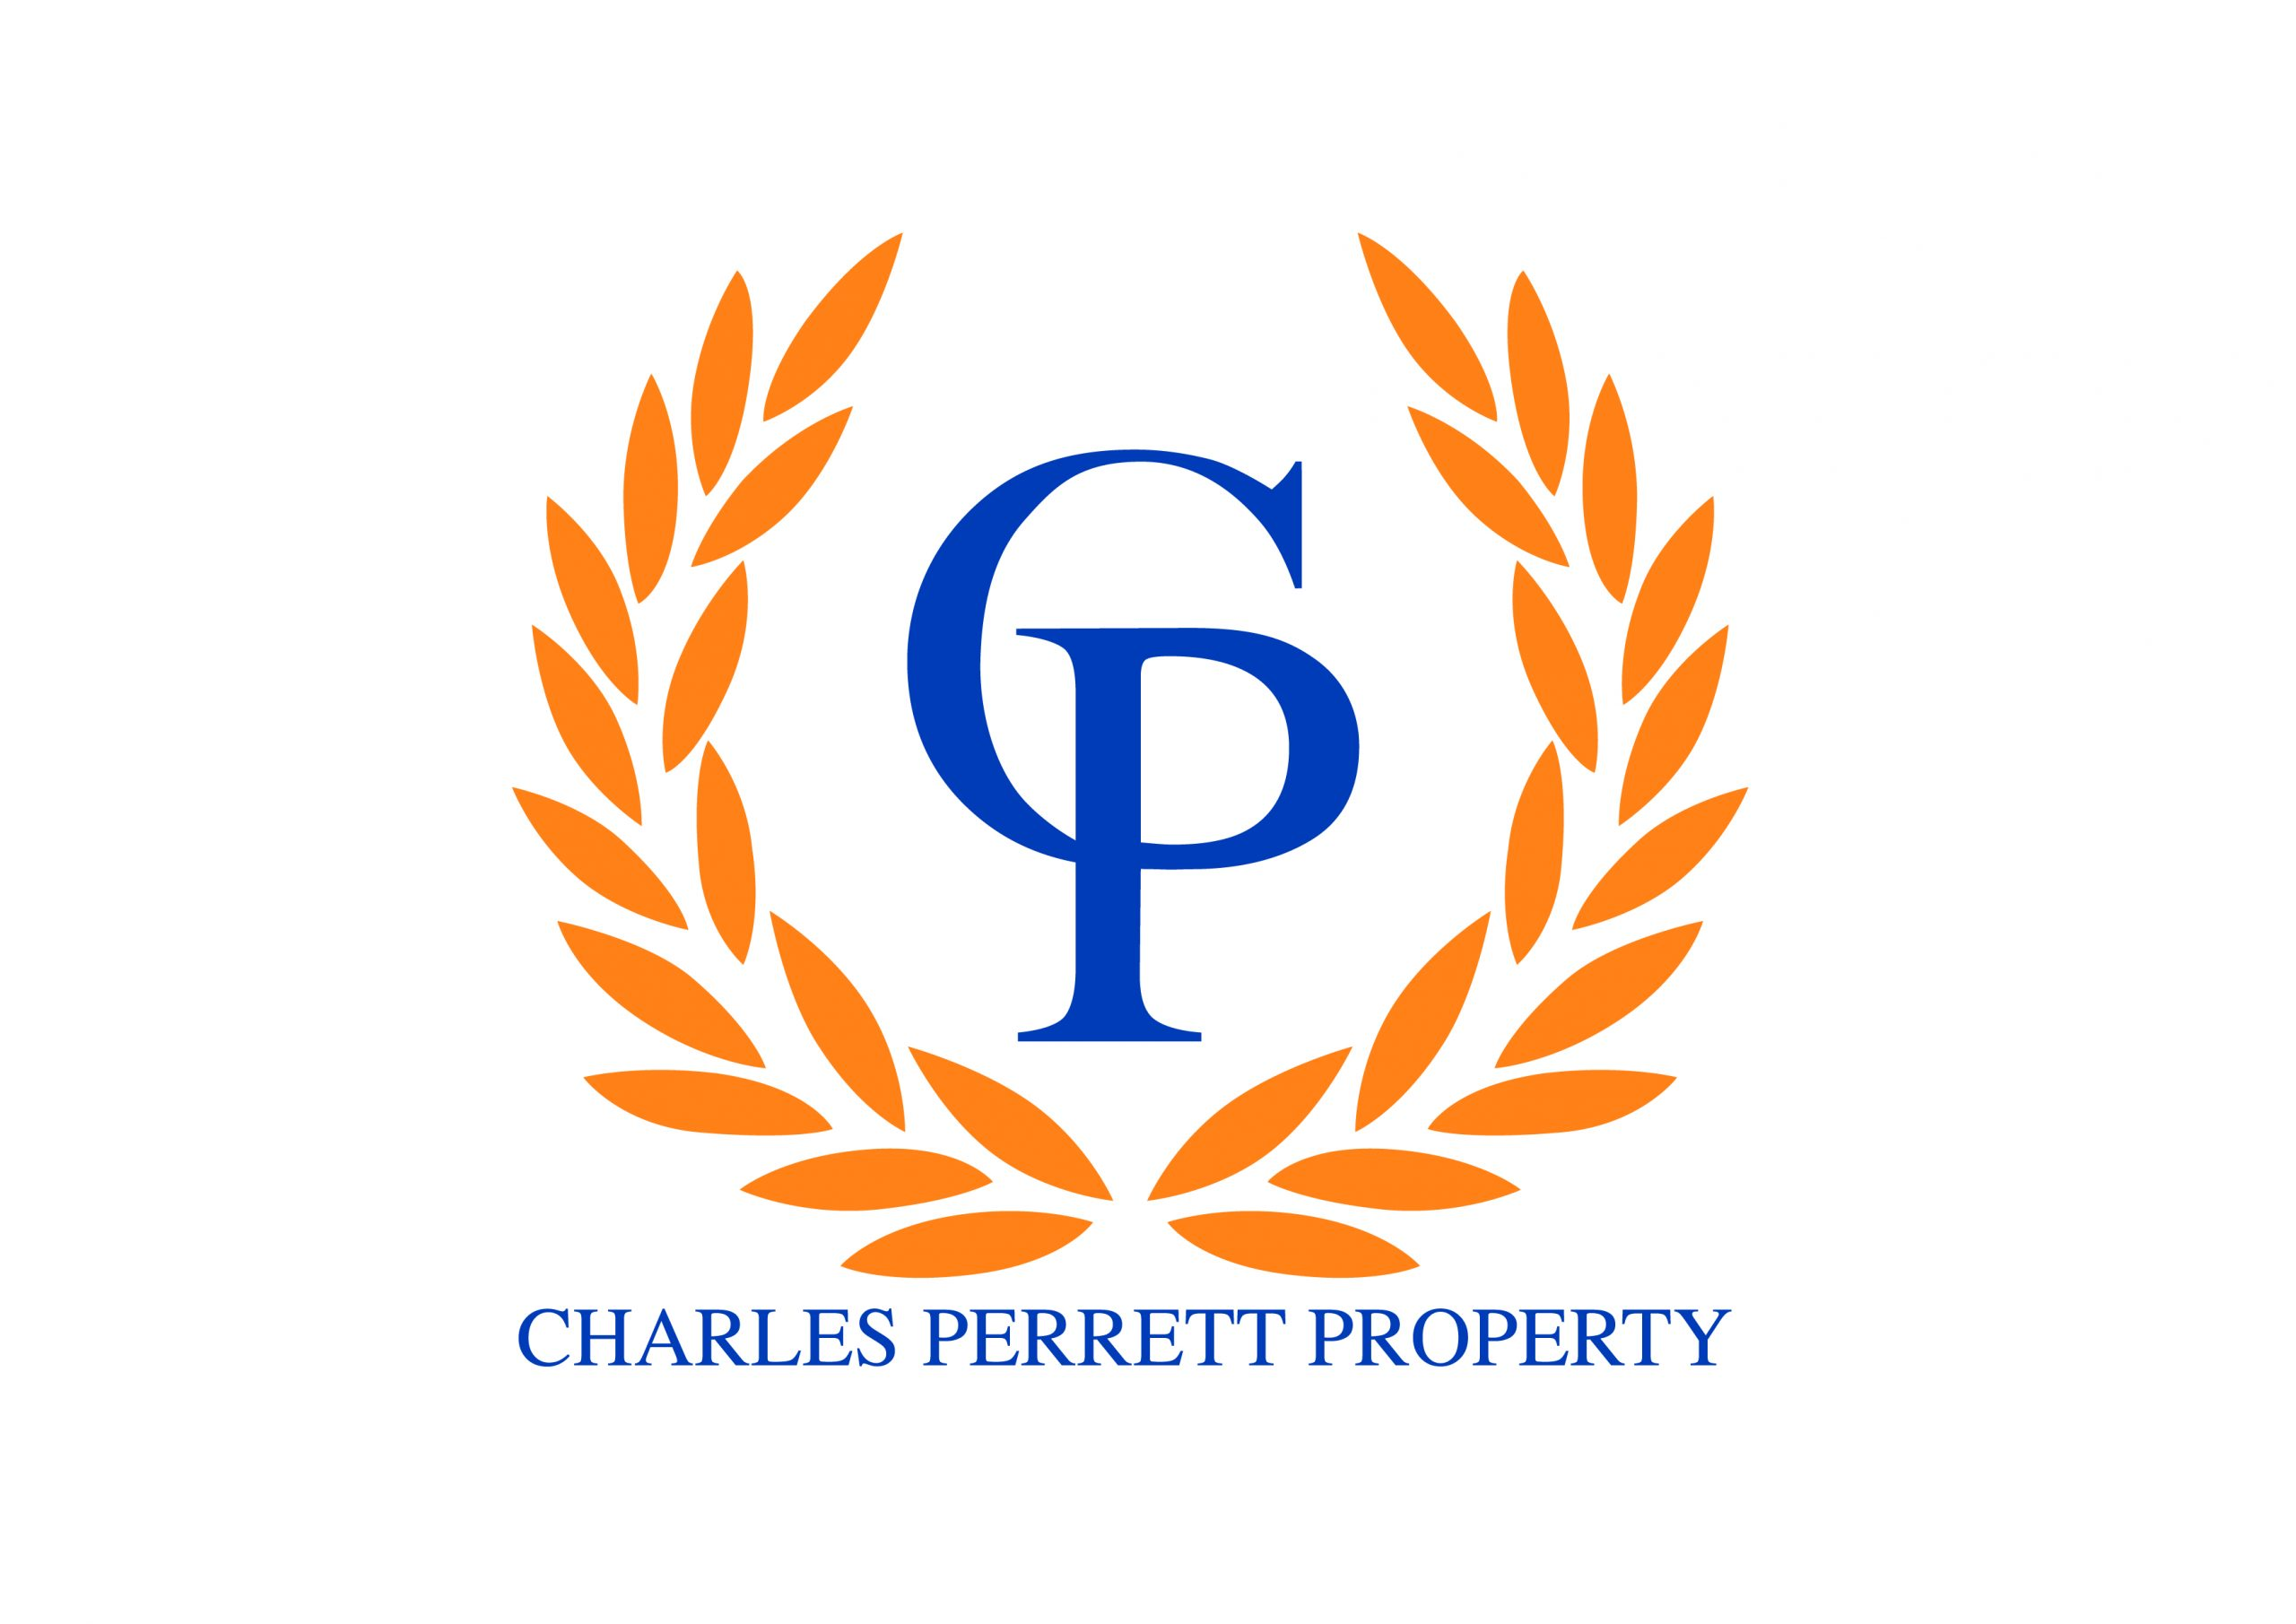 Charles Perrett Property